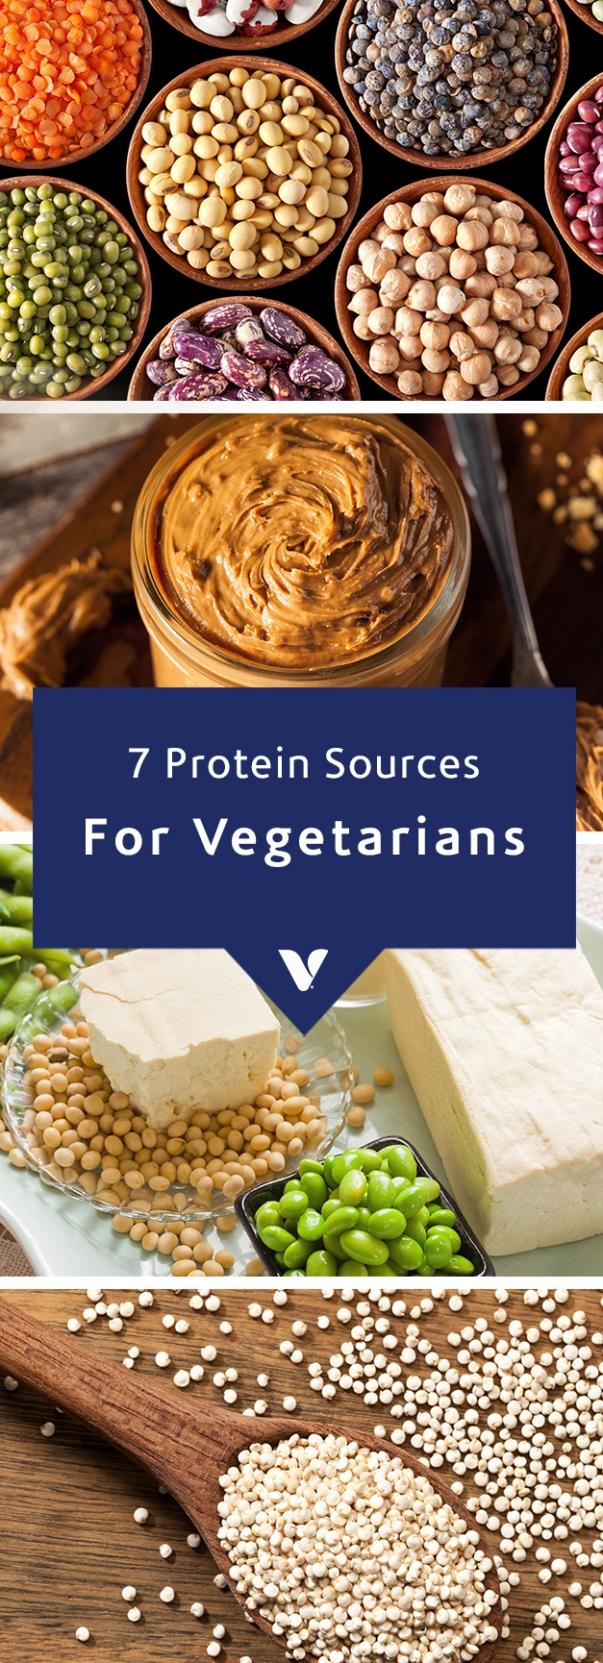 Vegetarian Proteins for Herbivores.jpg